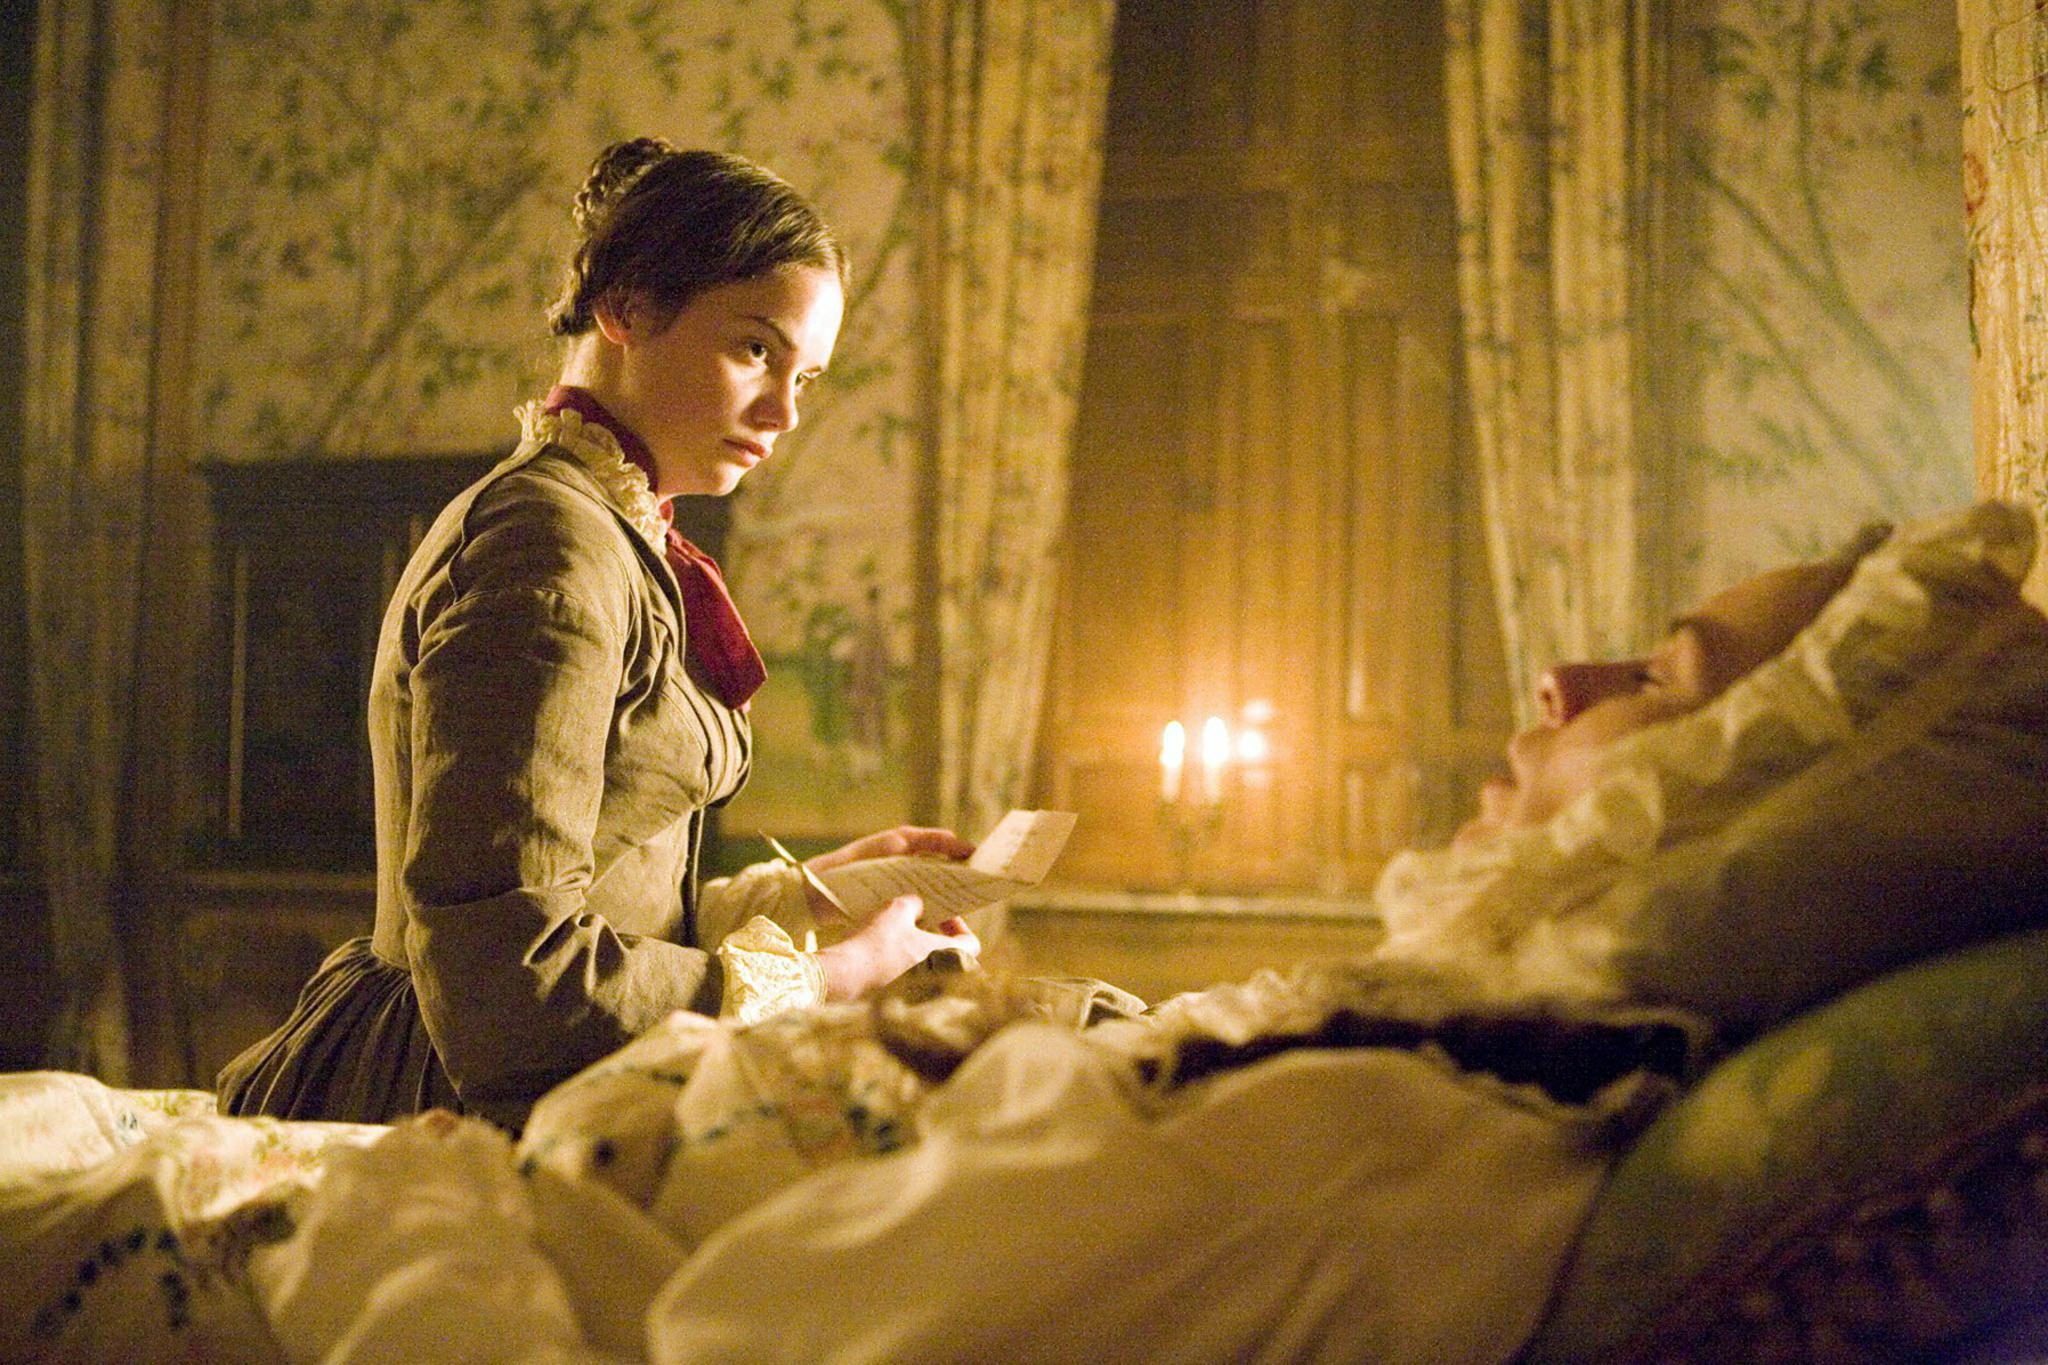 jane eyre 2009 Jane eyre is the fictional heroine of charlotte brontë's 1847 novel of the same name.